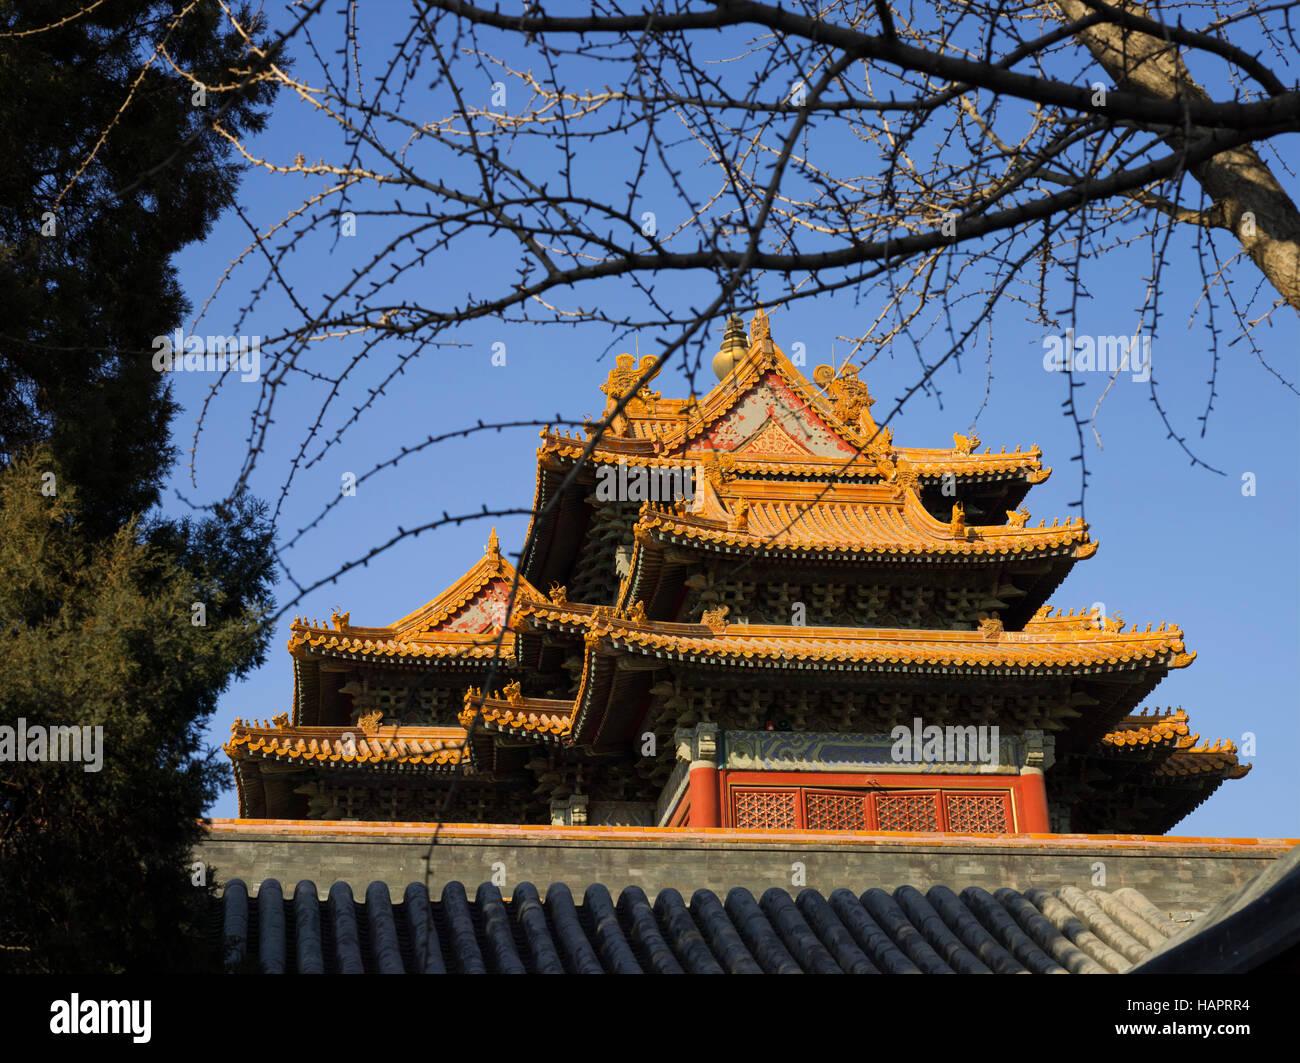 Corner turret ,The Forbidden City, Beijing China - Stock Image